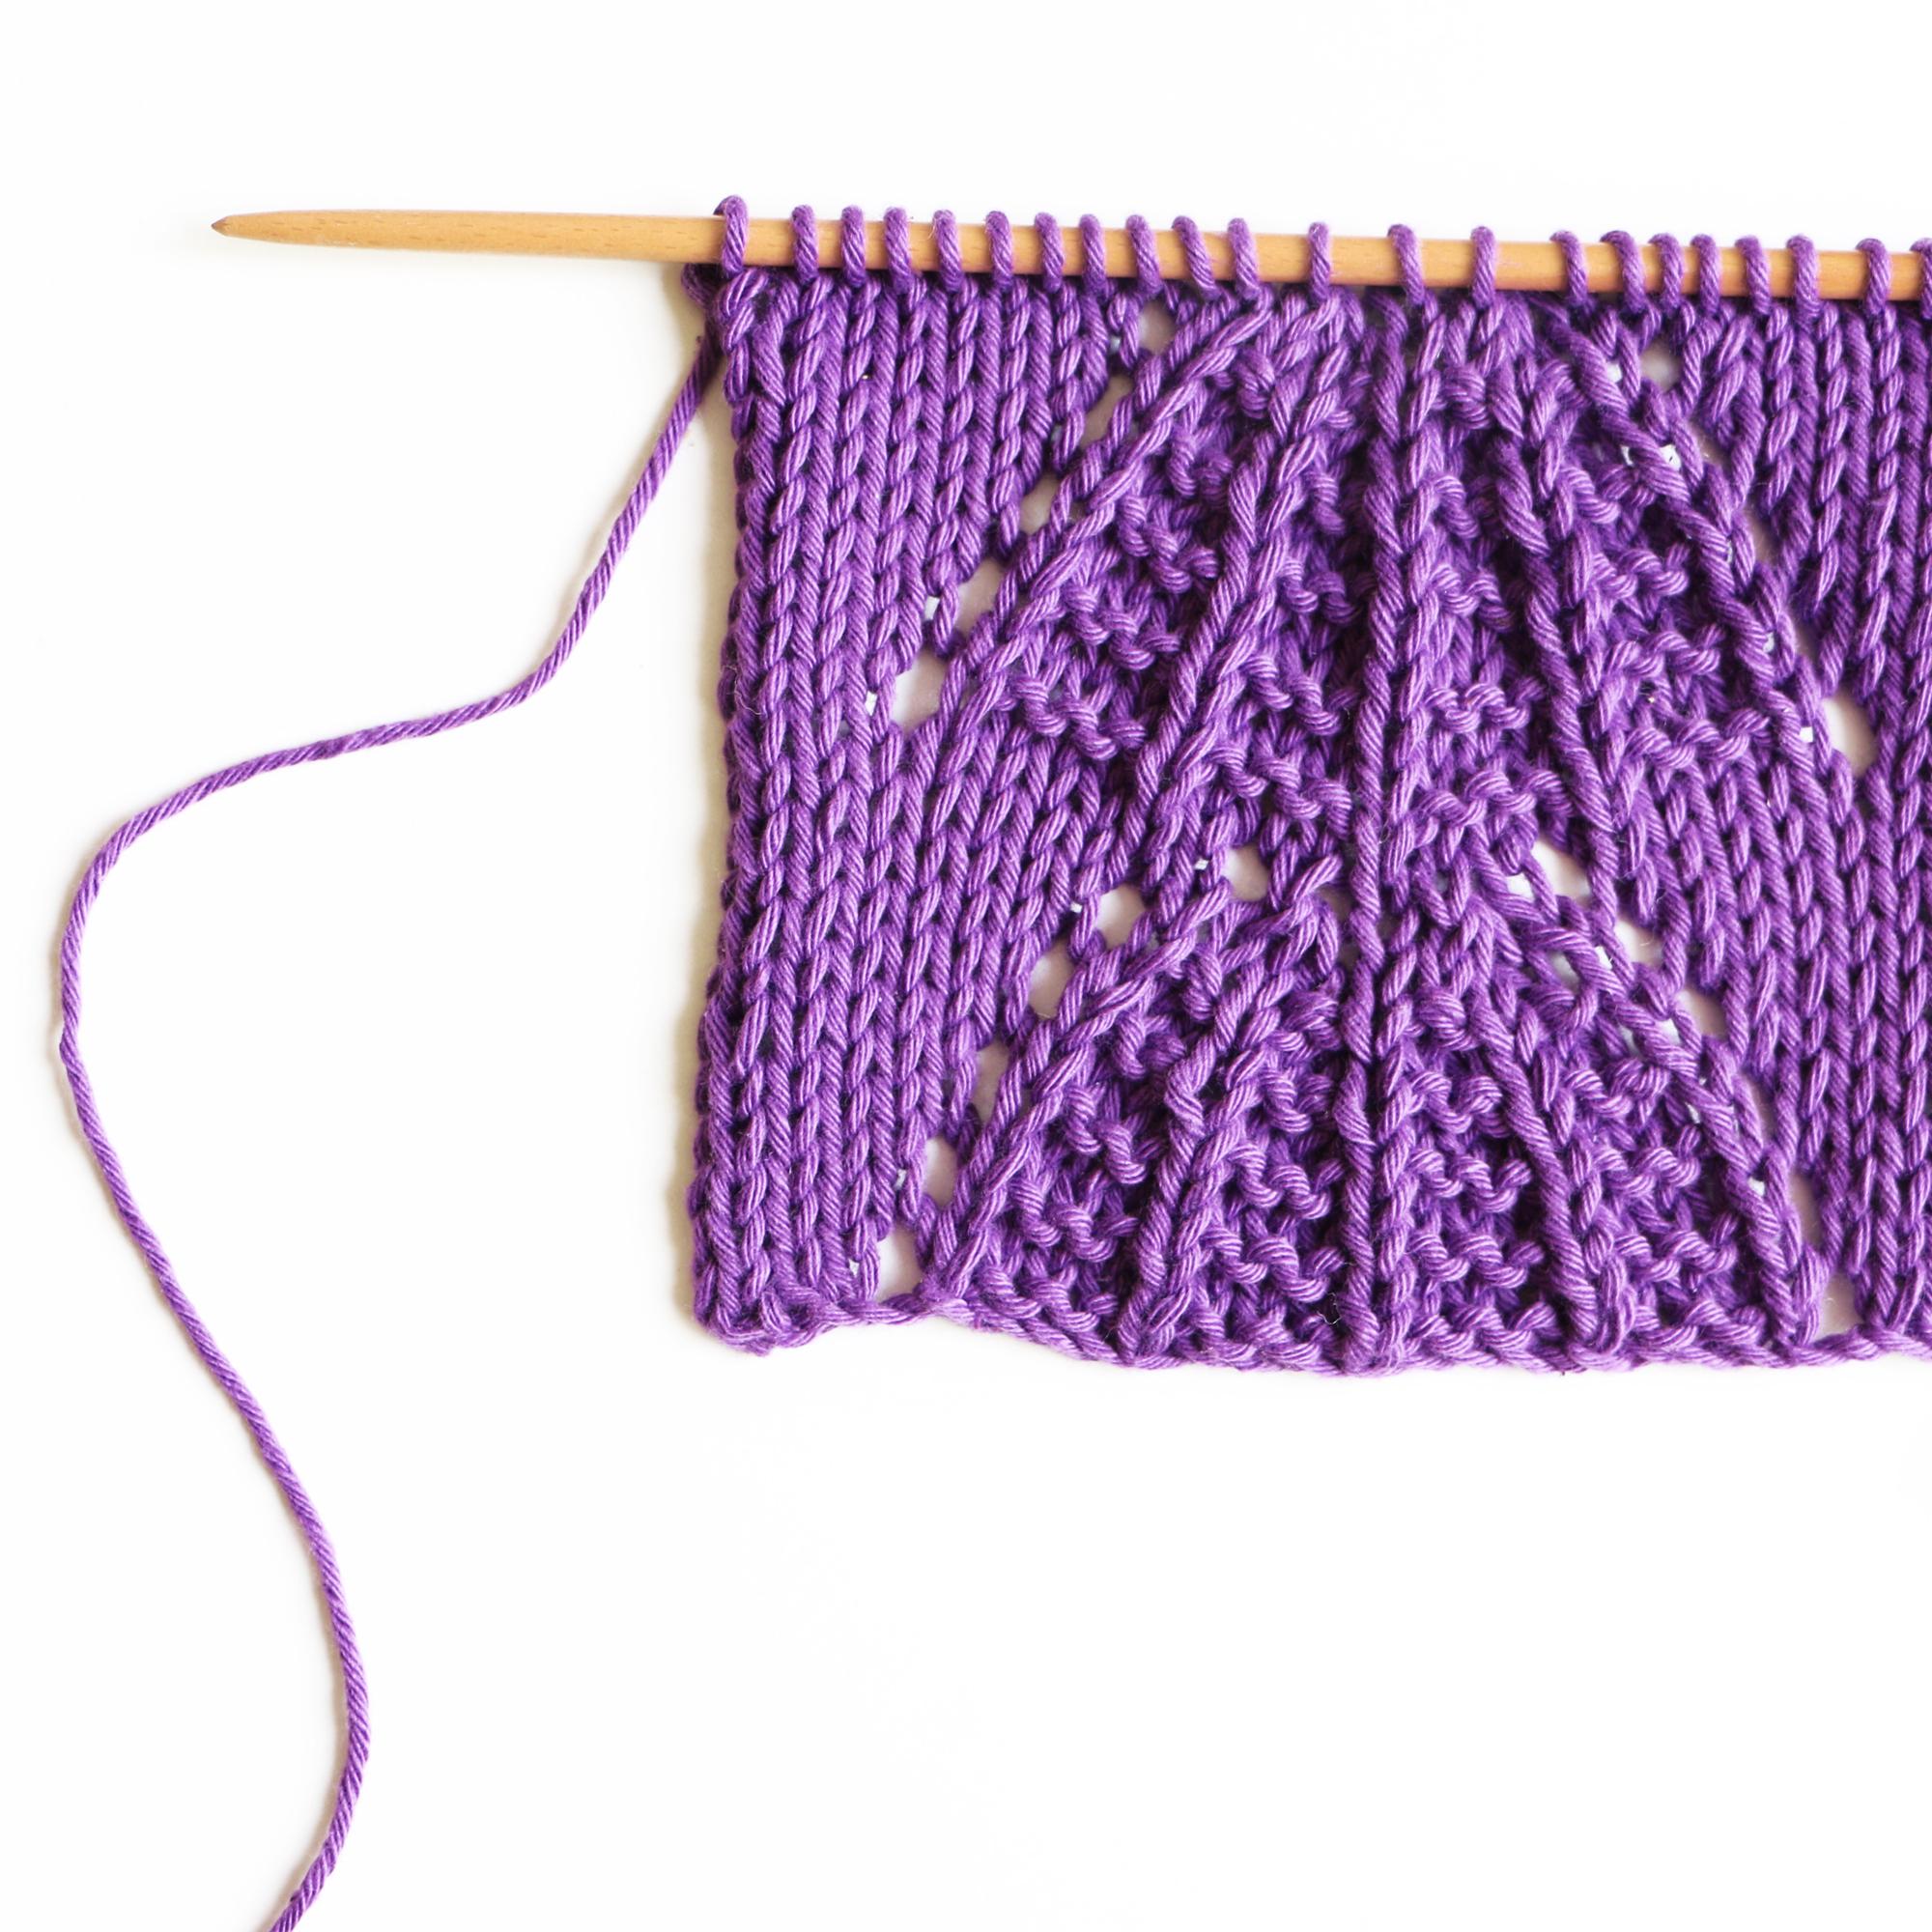 parasol-stitch.jpg